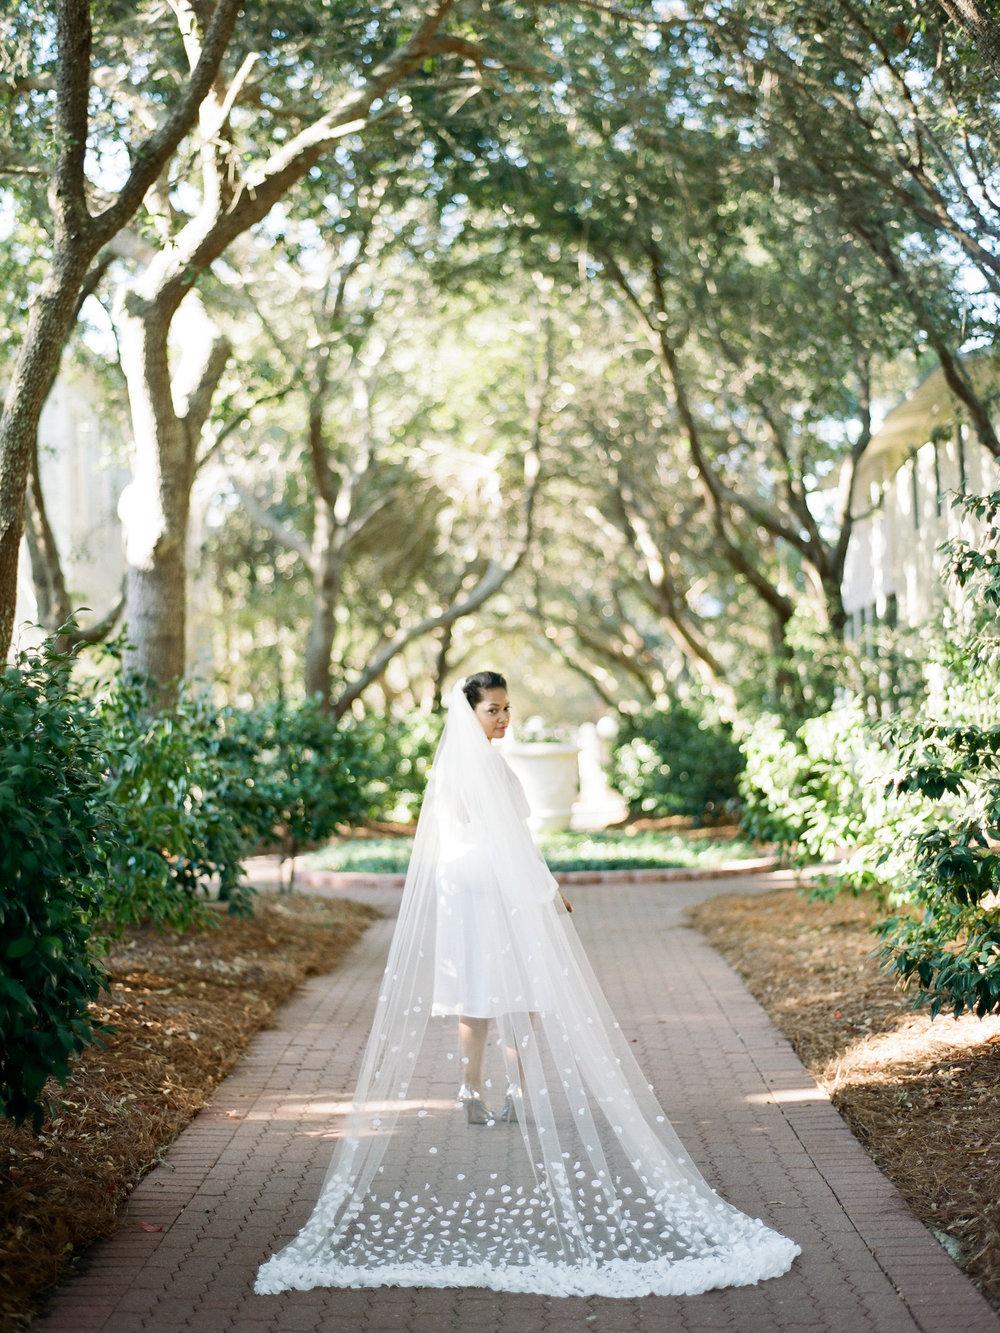 casandra_and_andy_carillon_beach_wedding_photographer_shannon_griffin_bride_and_groom-69.jpg